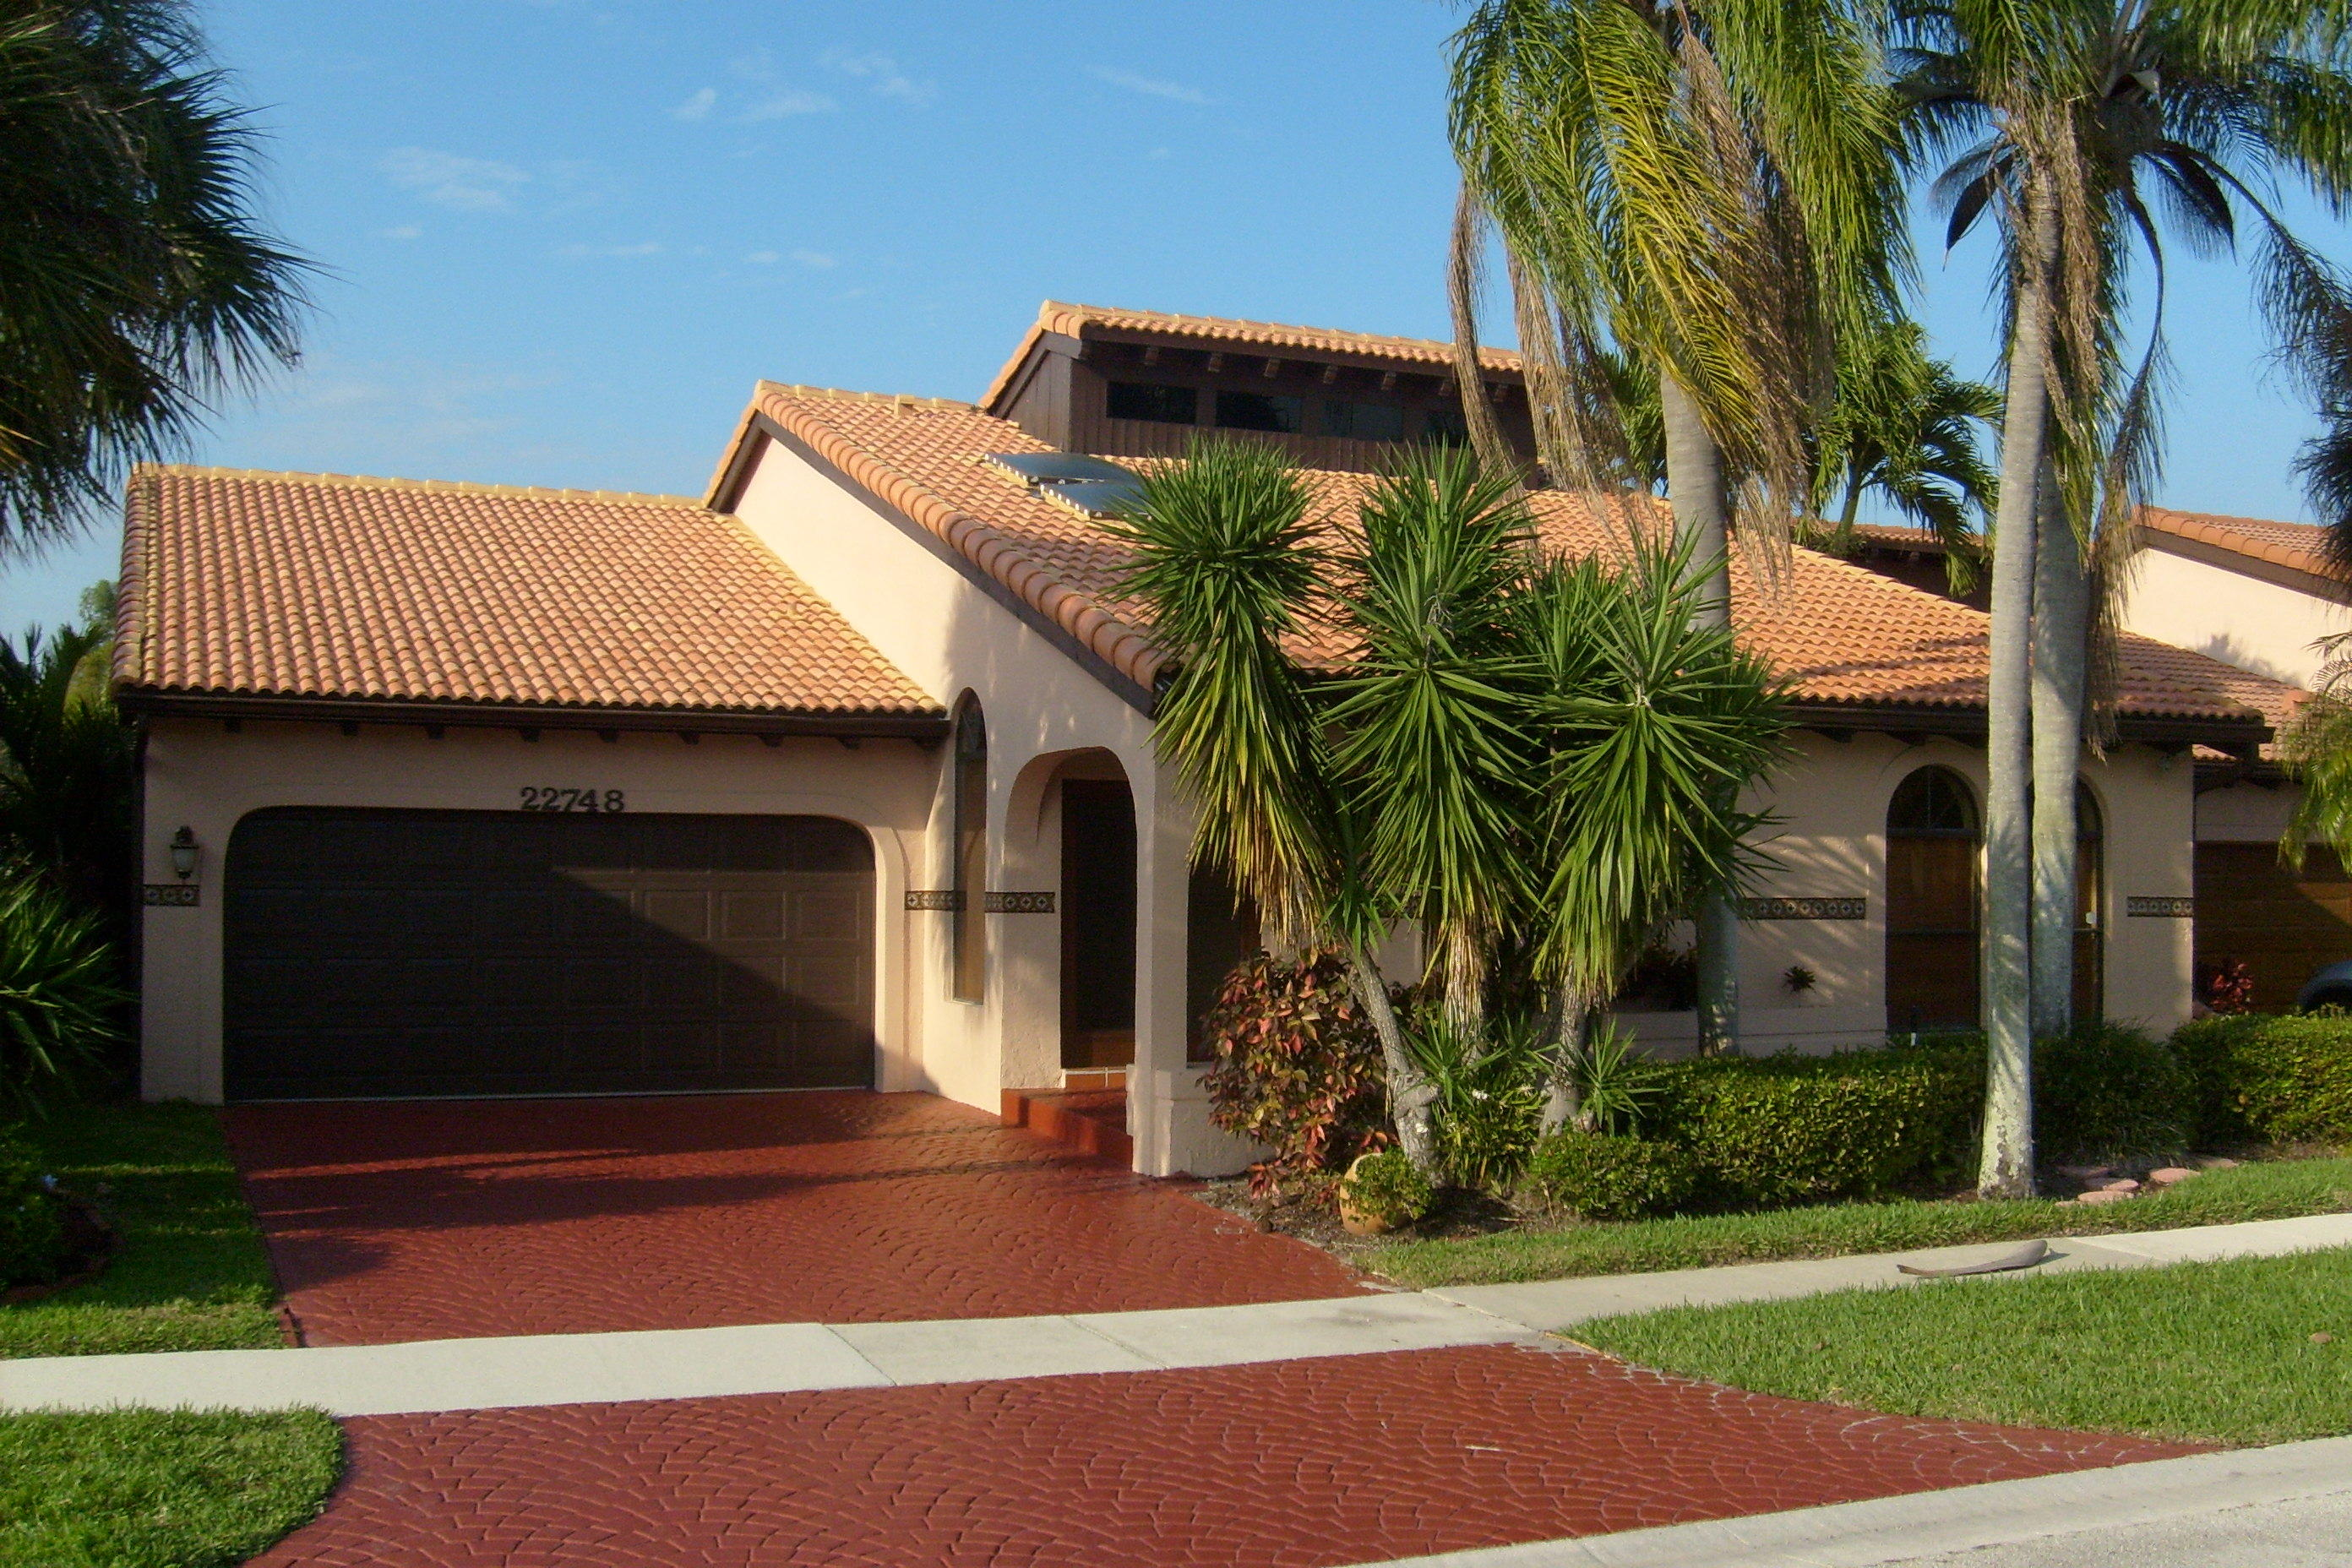 22748 Marbella Circle  Boca Raton FL 33433